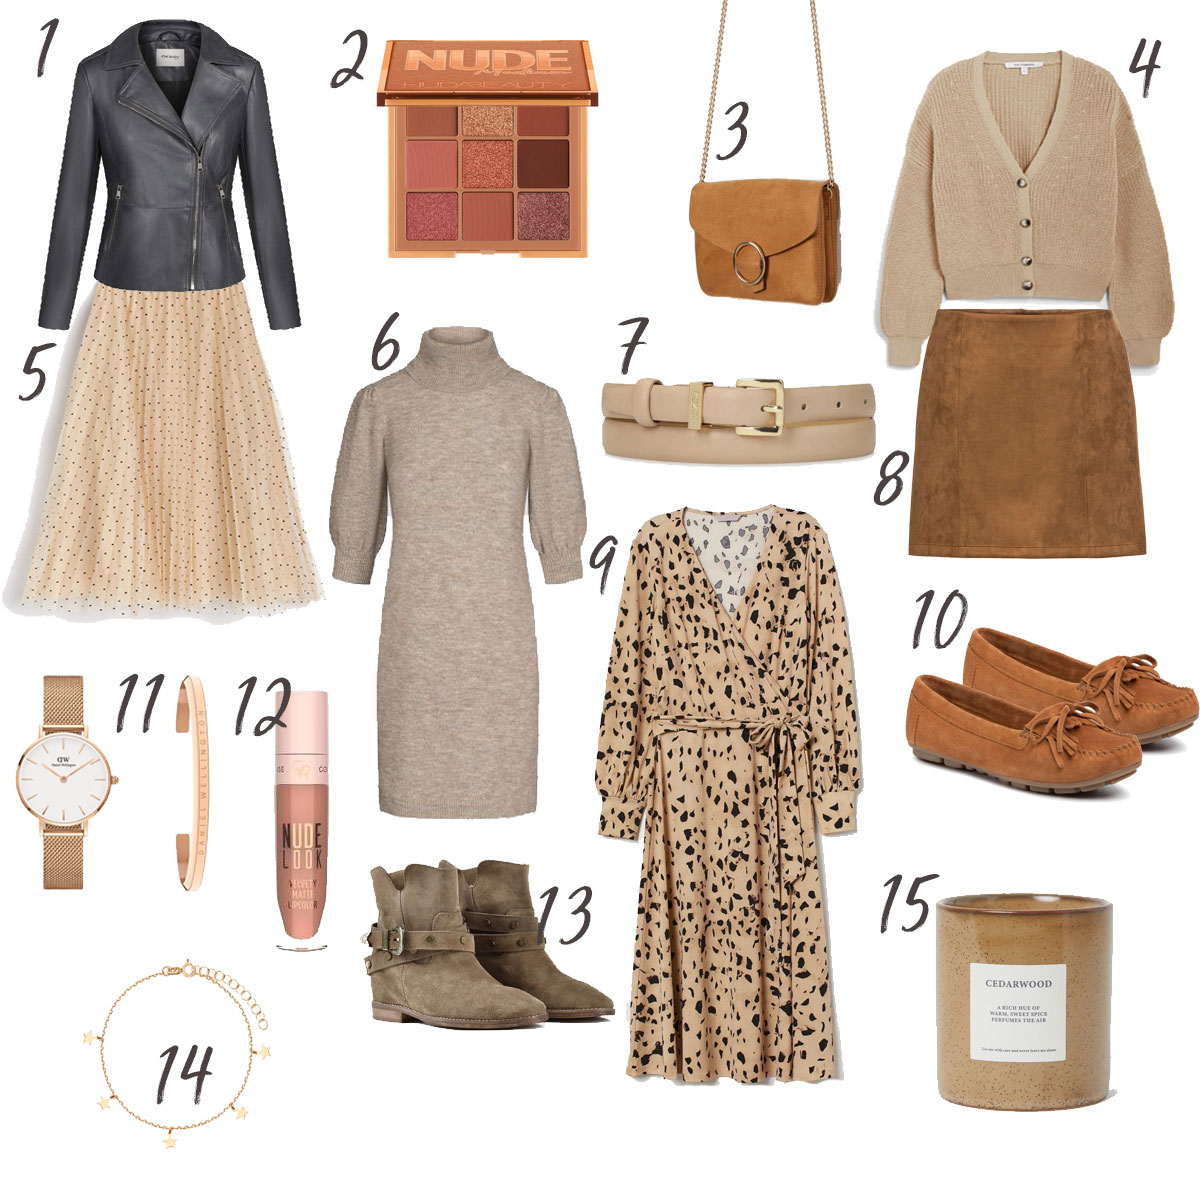 modne ubrania na jesień